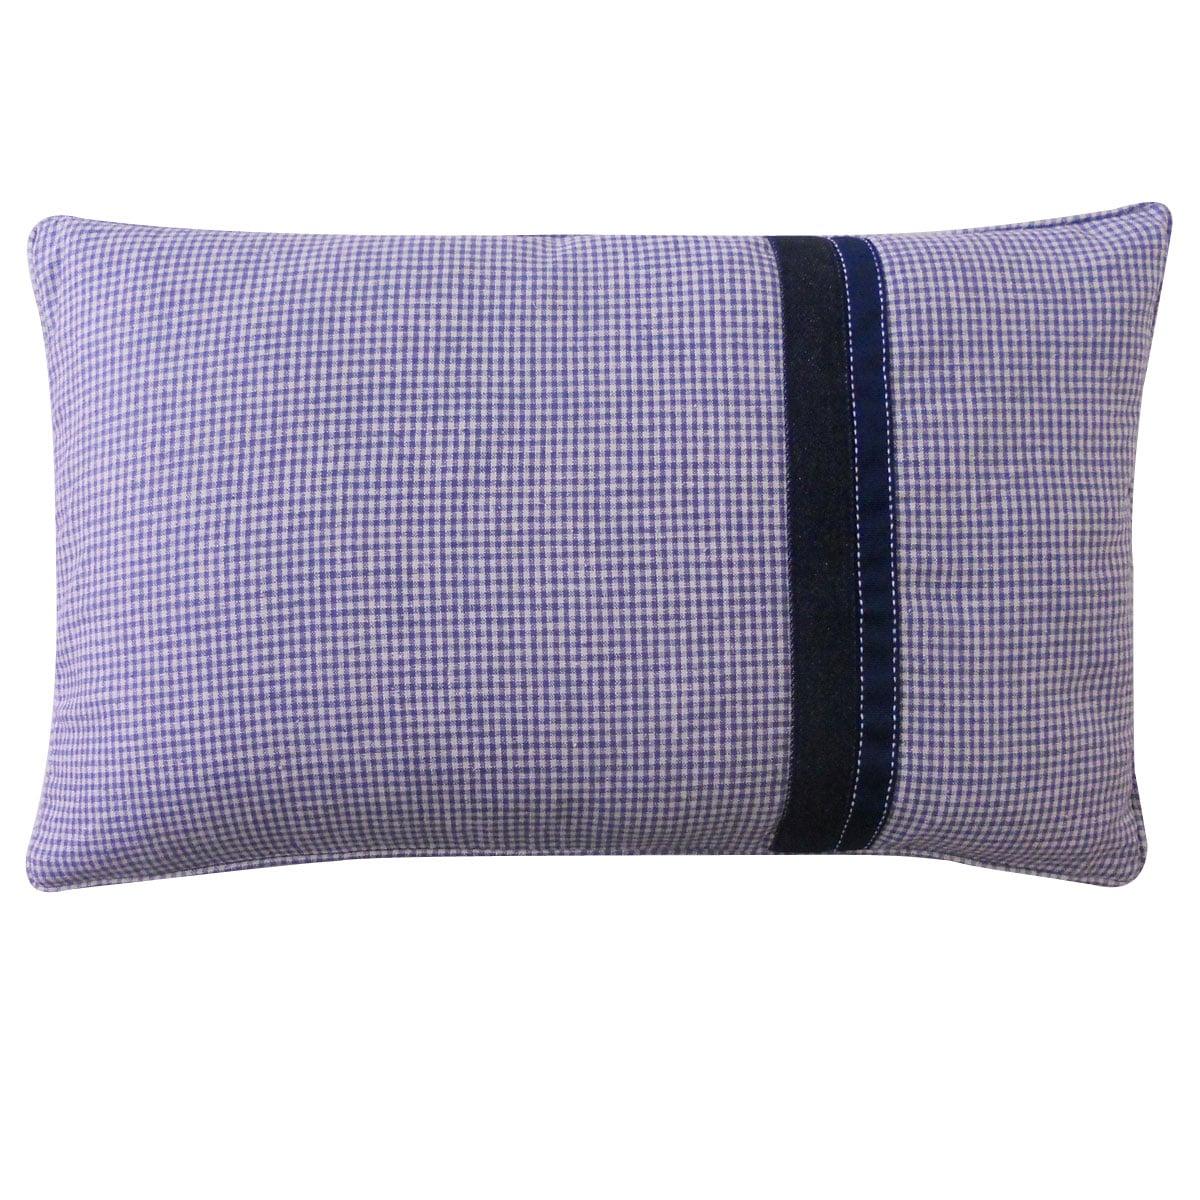 Gingham Kids Pillow